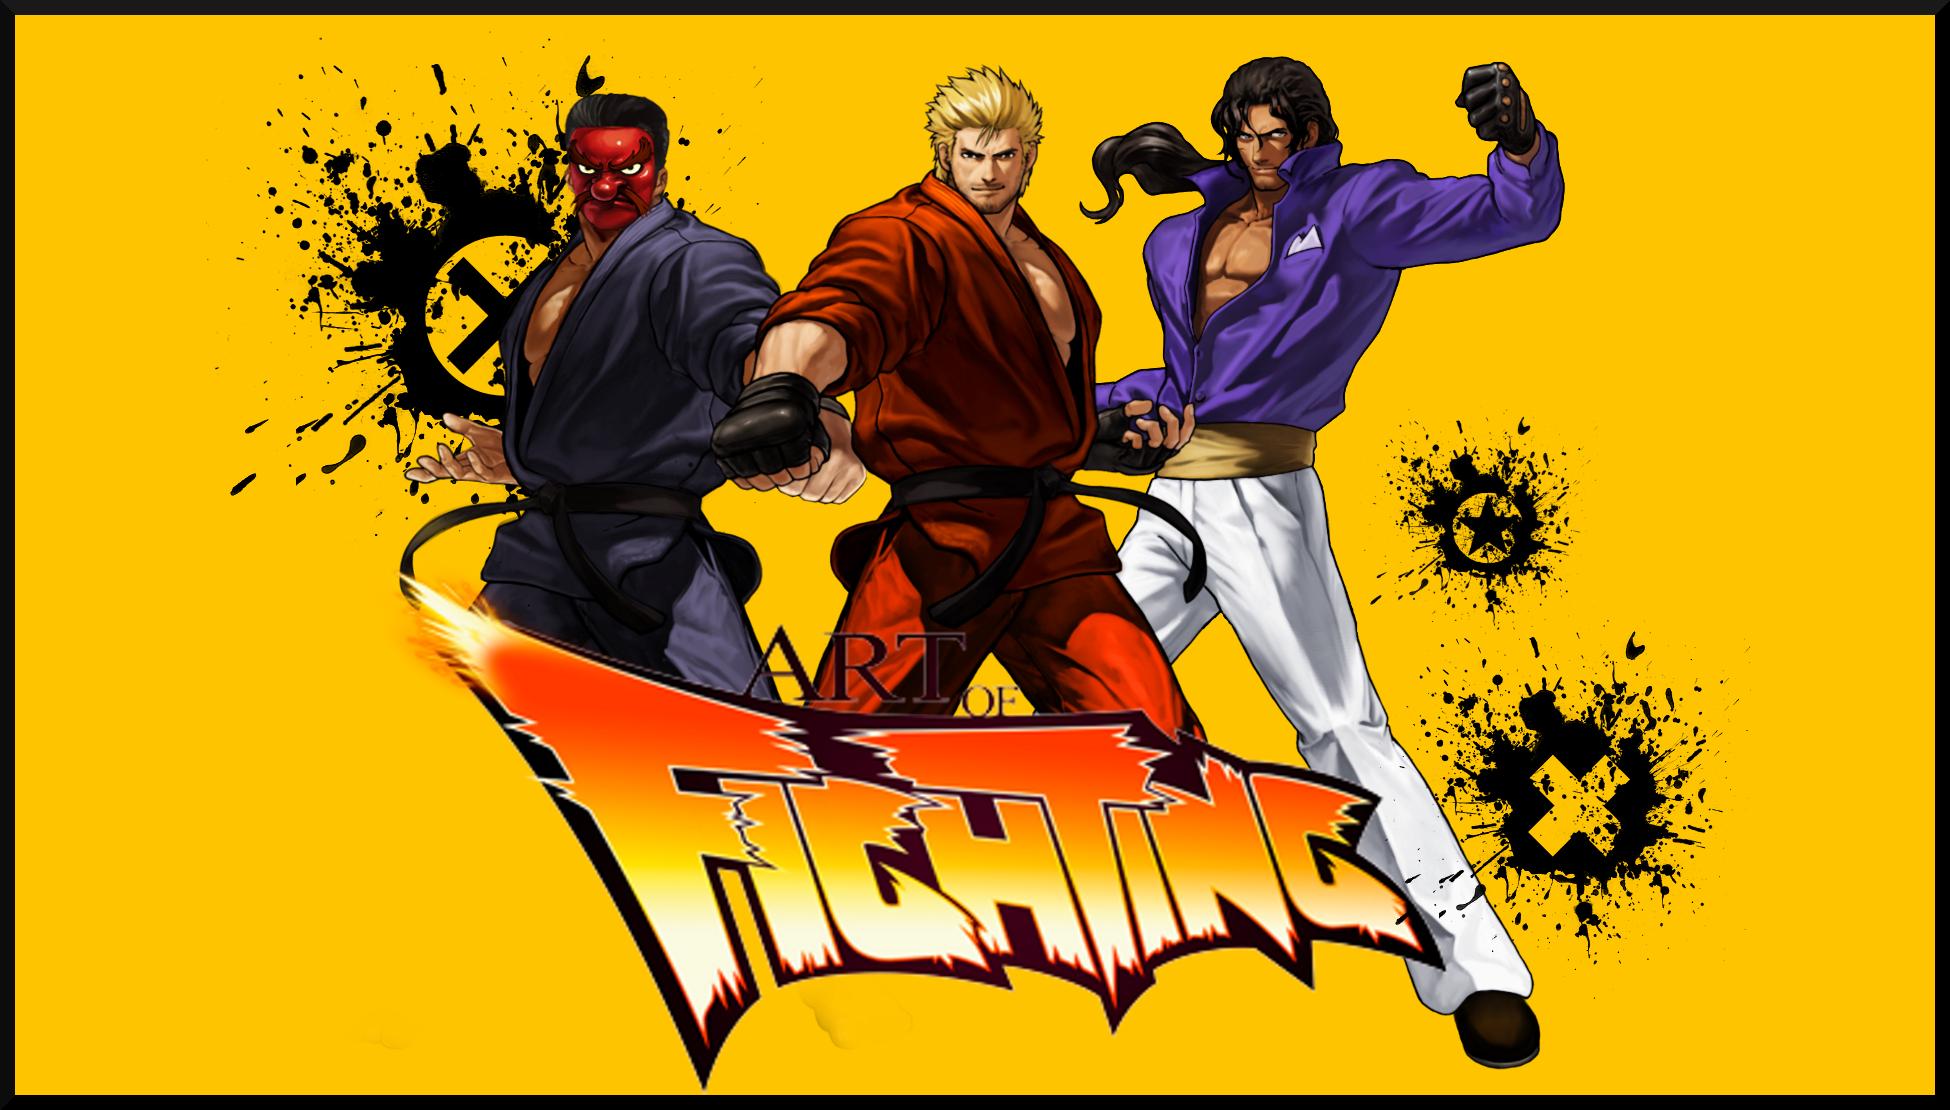 Kof Art Of Fighting Kyoguken Ryu Team By Topdog4815 On Deviantart